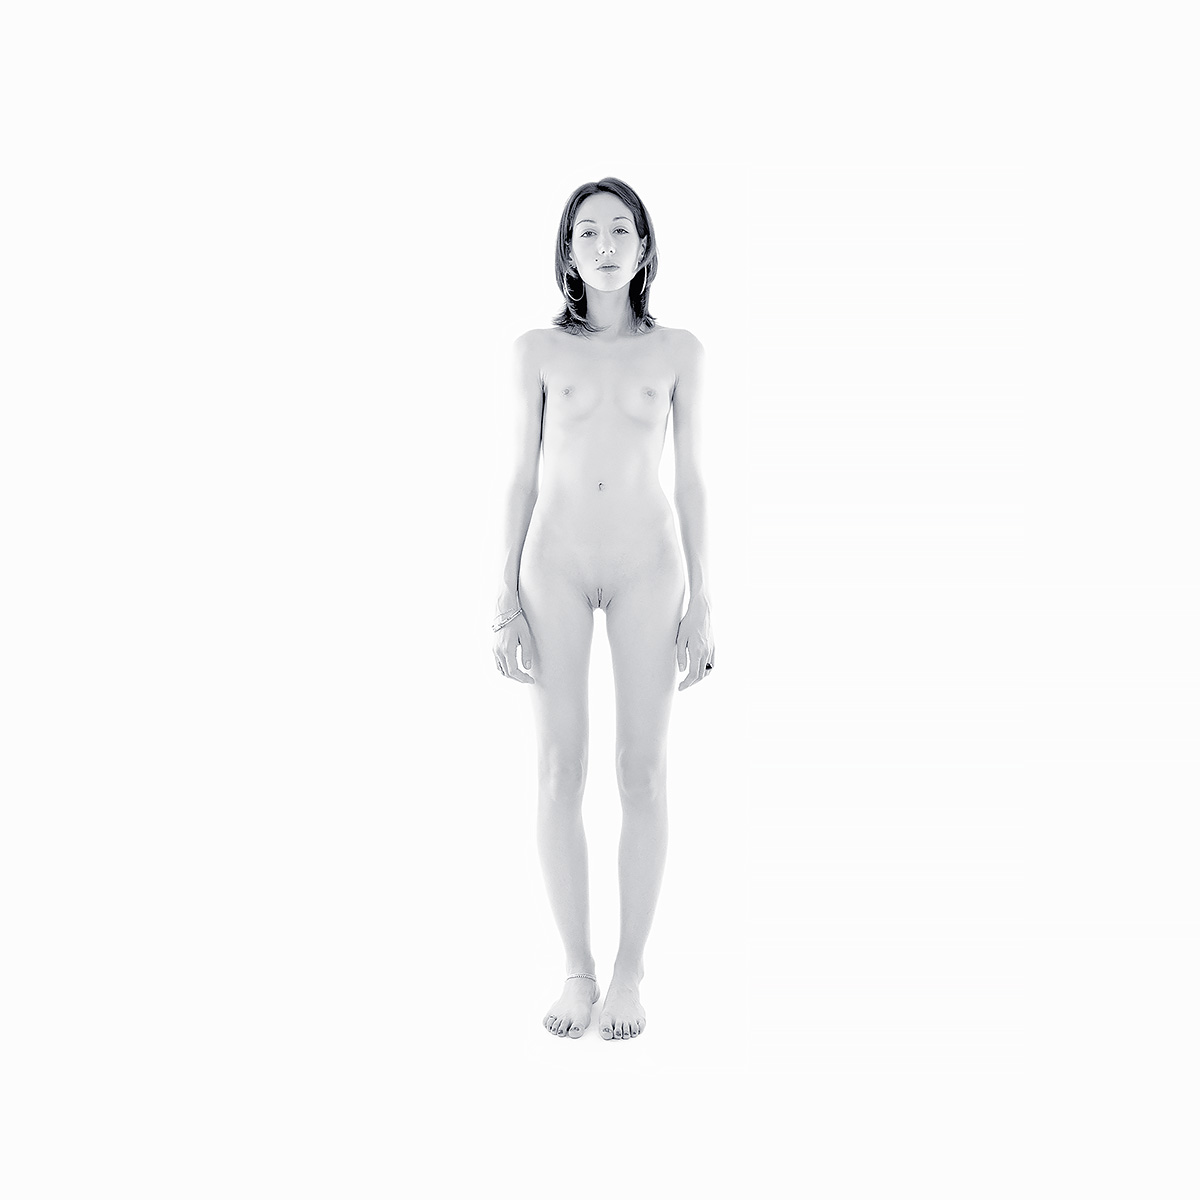 2018 The last HomoSapiens Bodies 004 tty art 1200 - 2018 - The last HomoSapiens. Bodies